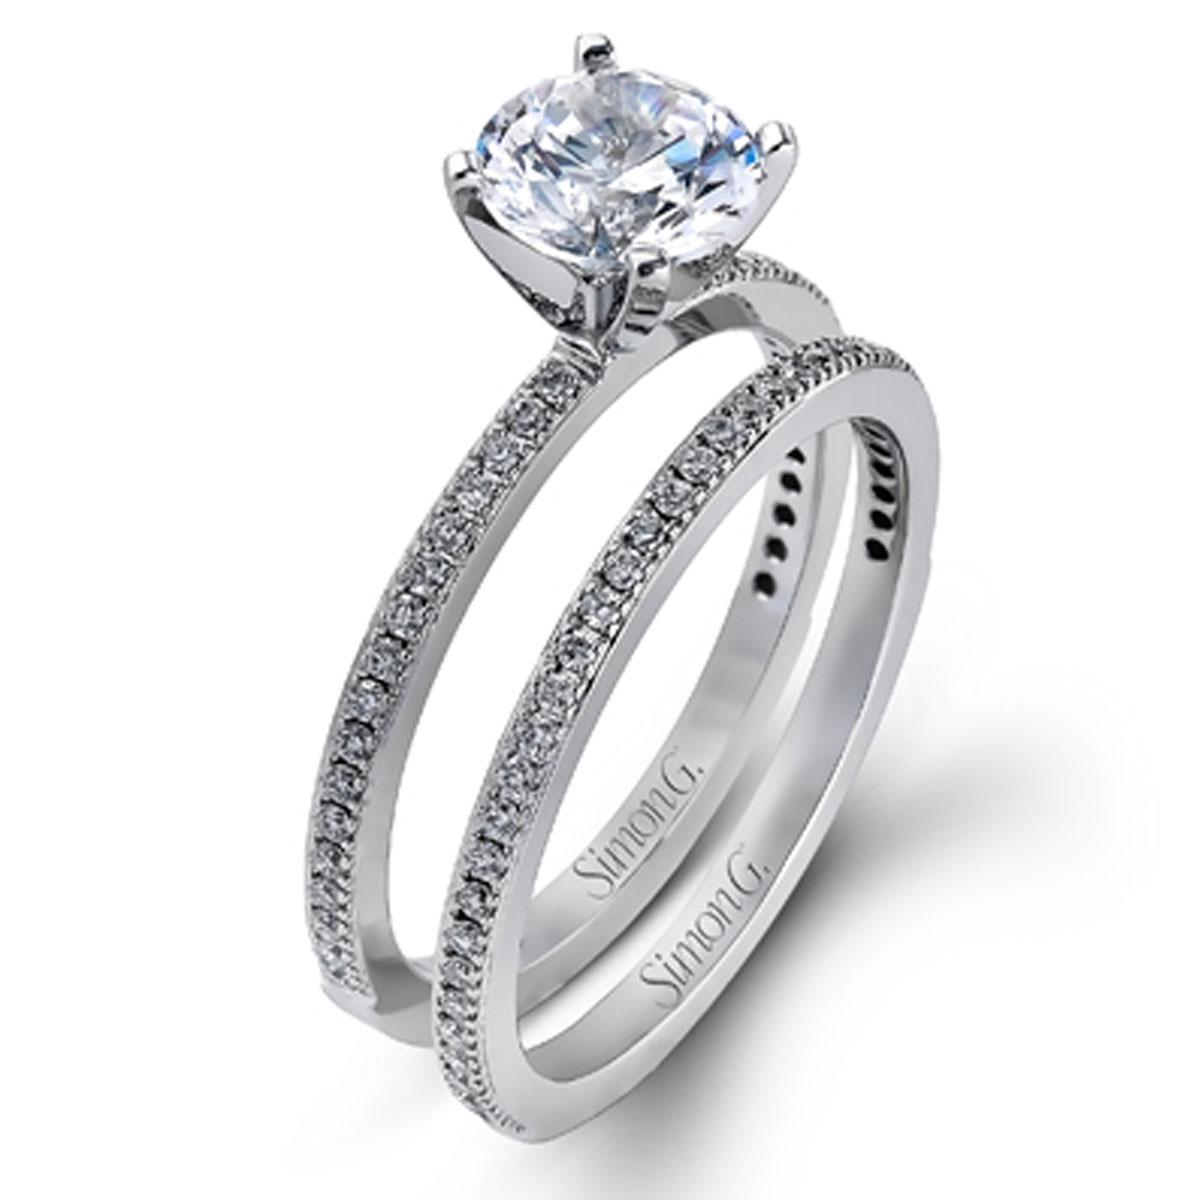 Simon G Engagement Rings 30ctw Accents Diamond Setting